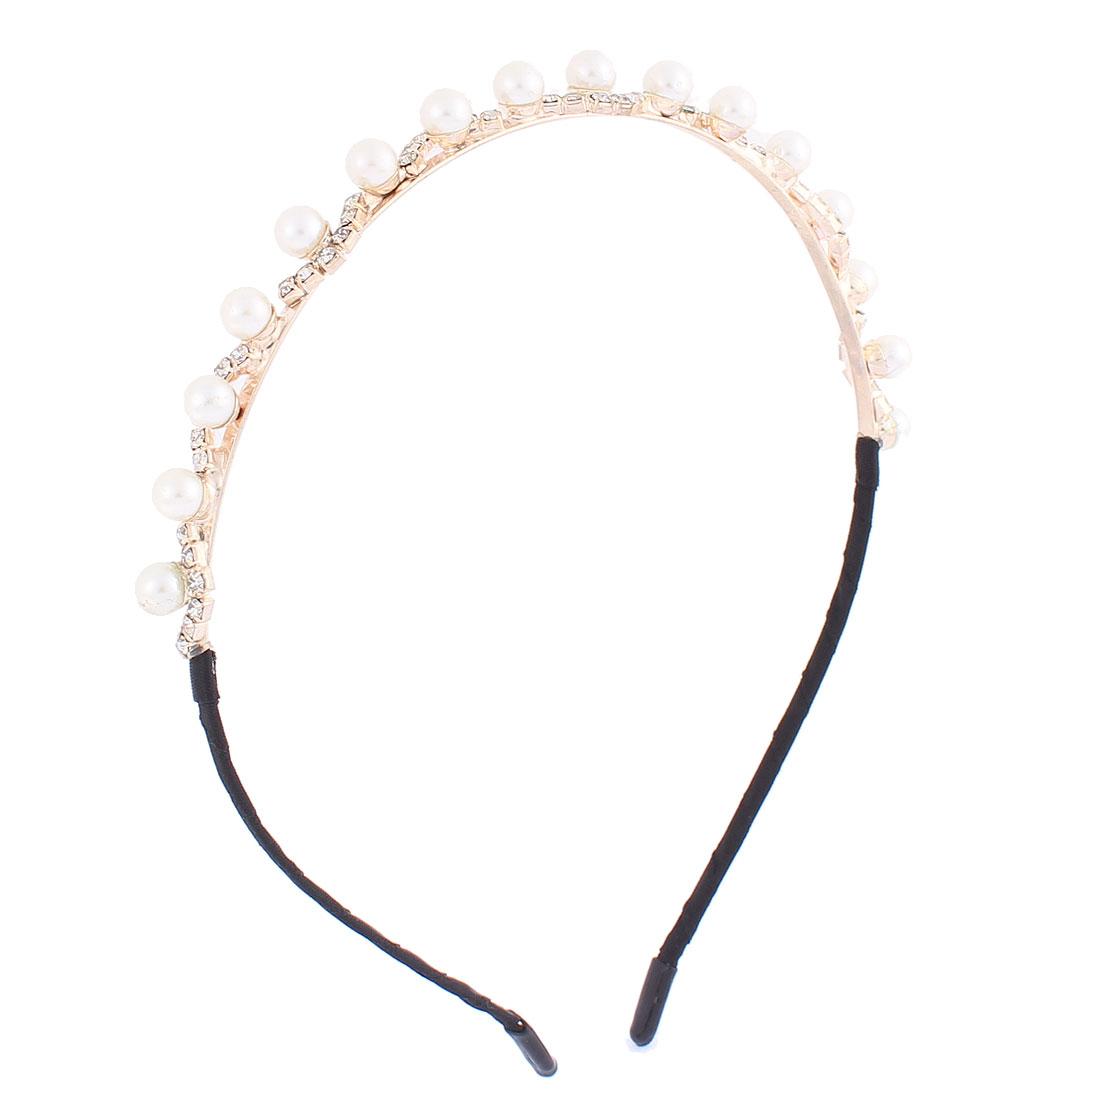 Rhinestone Inlaid Plastic Imitation Pearl Decor Hair Hoop Bangs Hairband Headband Silver Tone